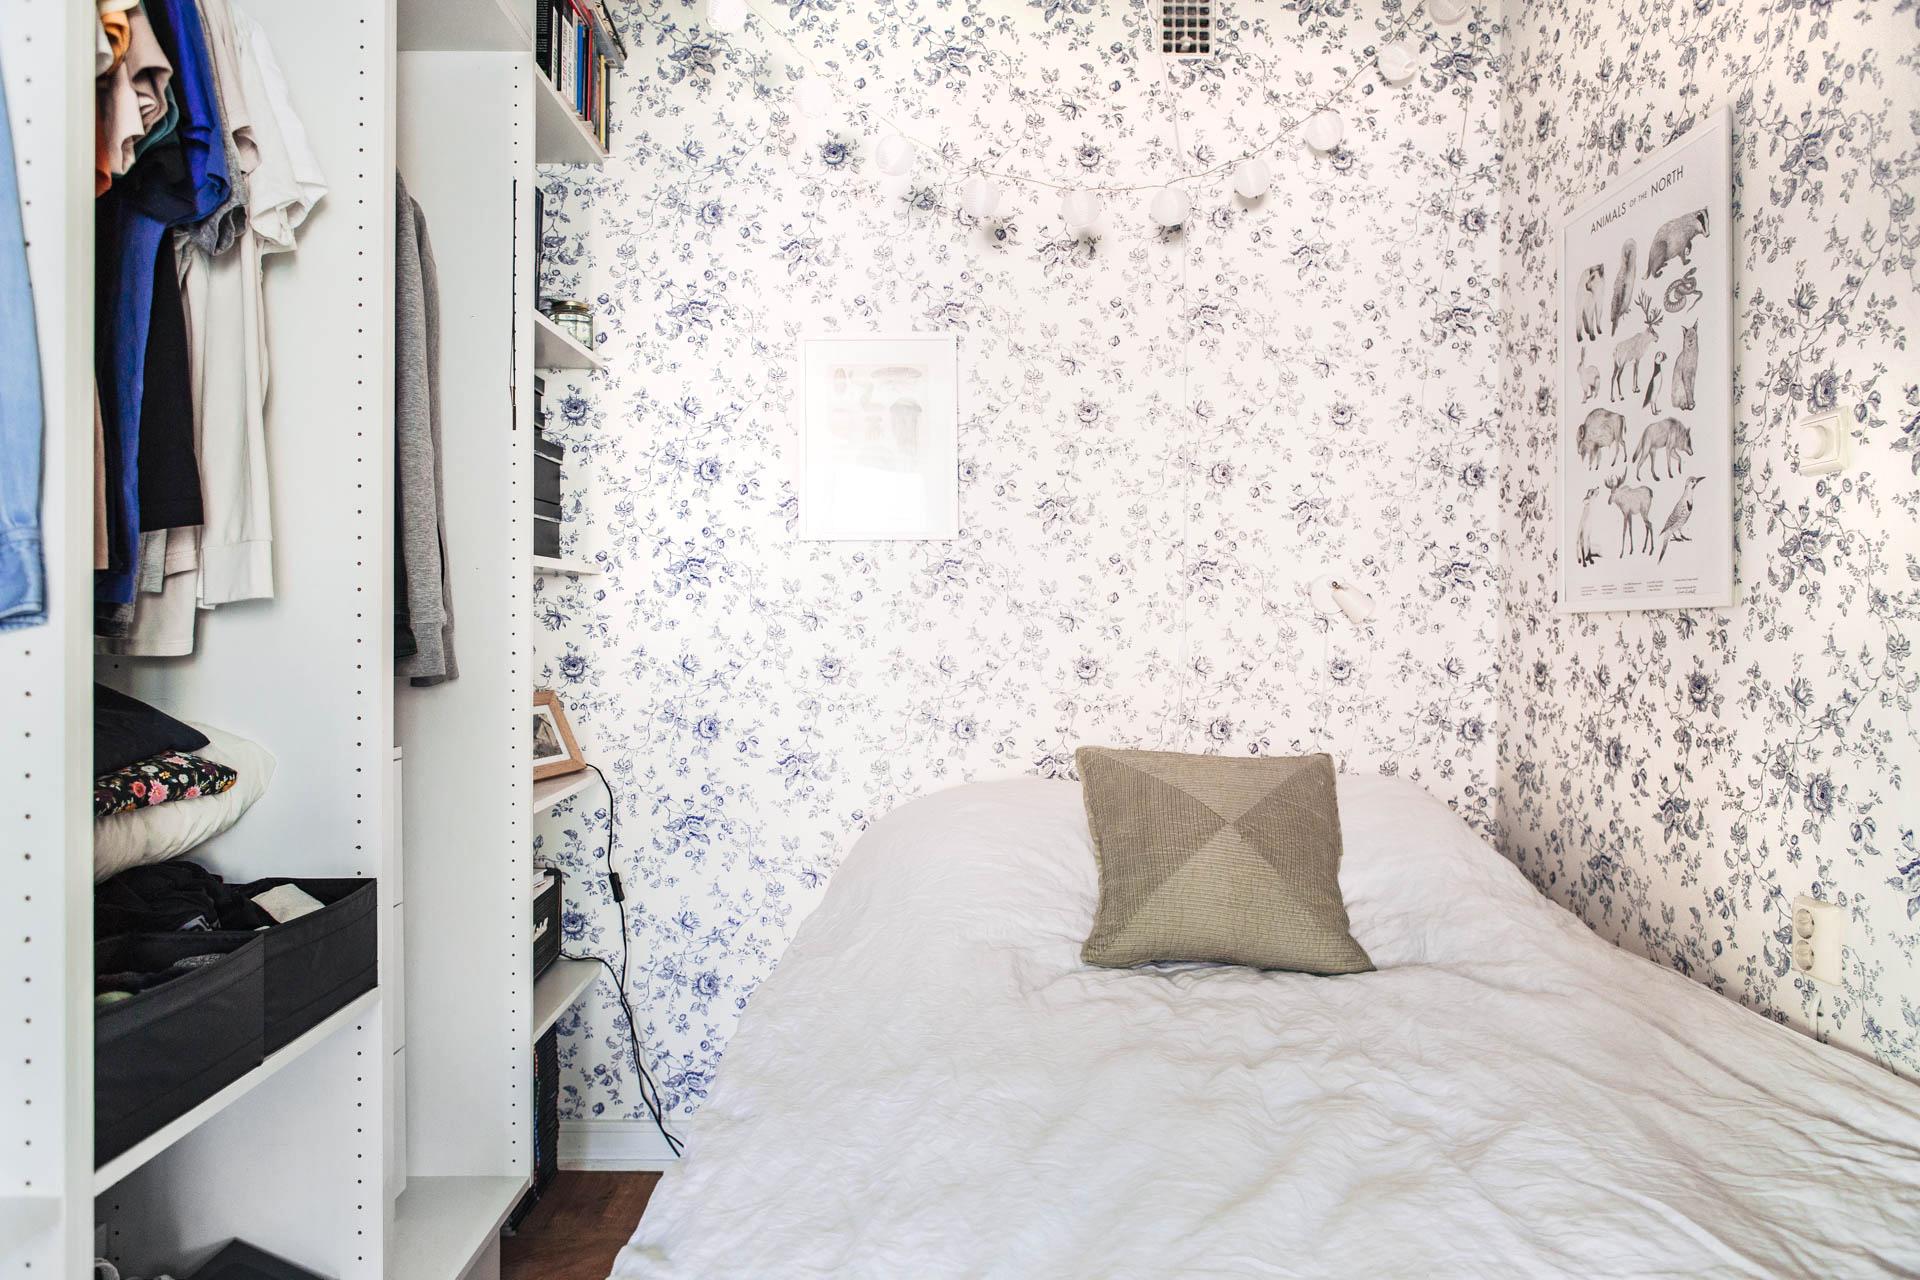 Kleine vintage slaapkamer met open kledingkastInterieur inrichting ...